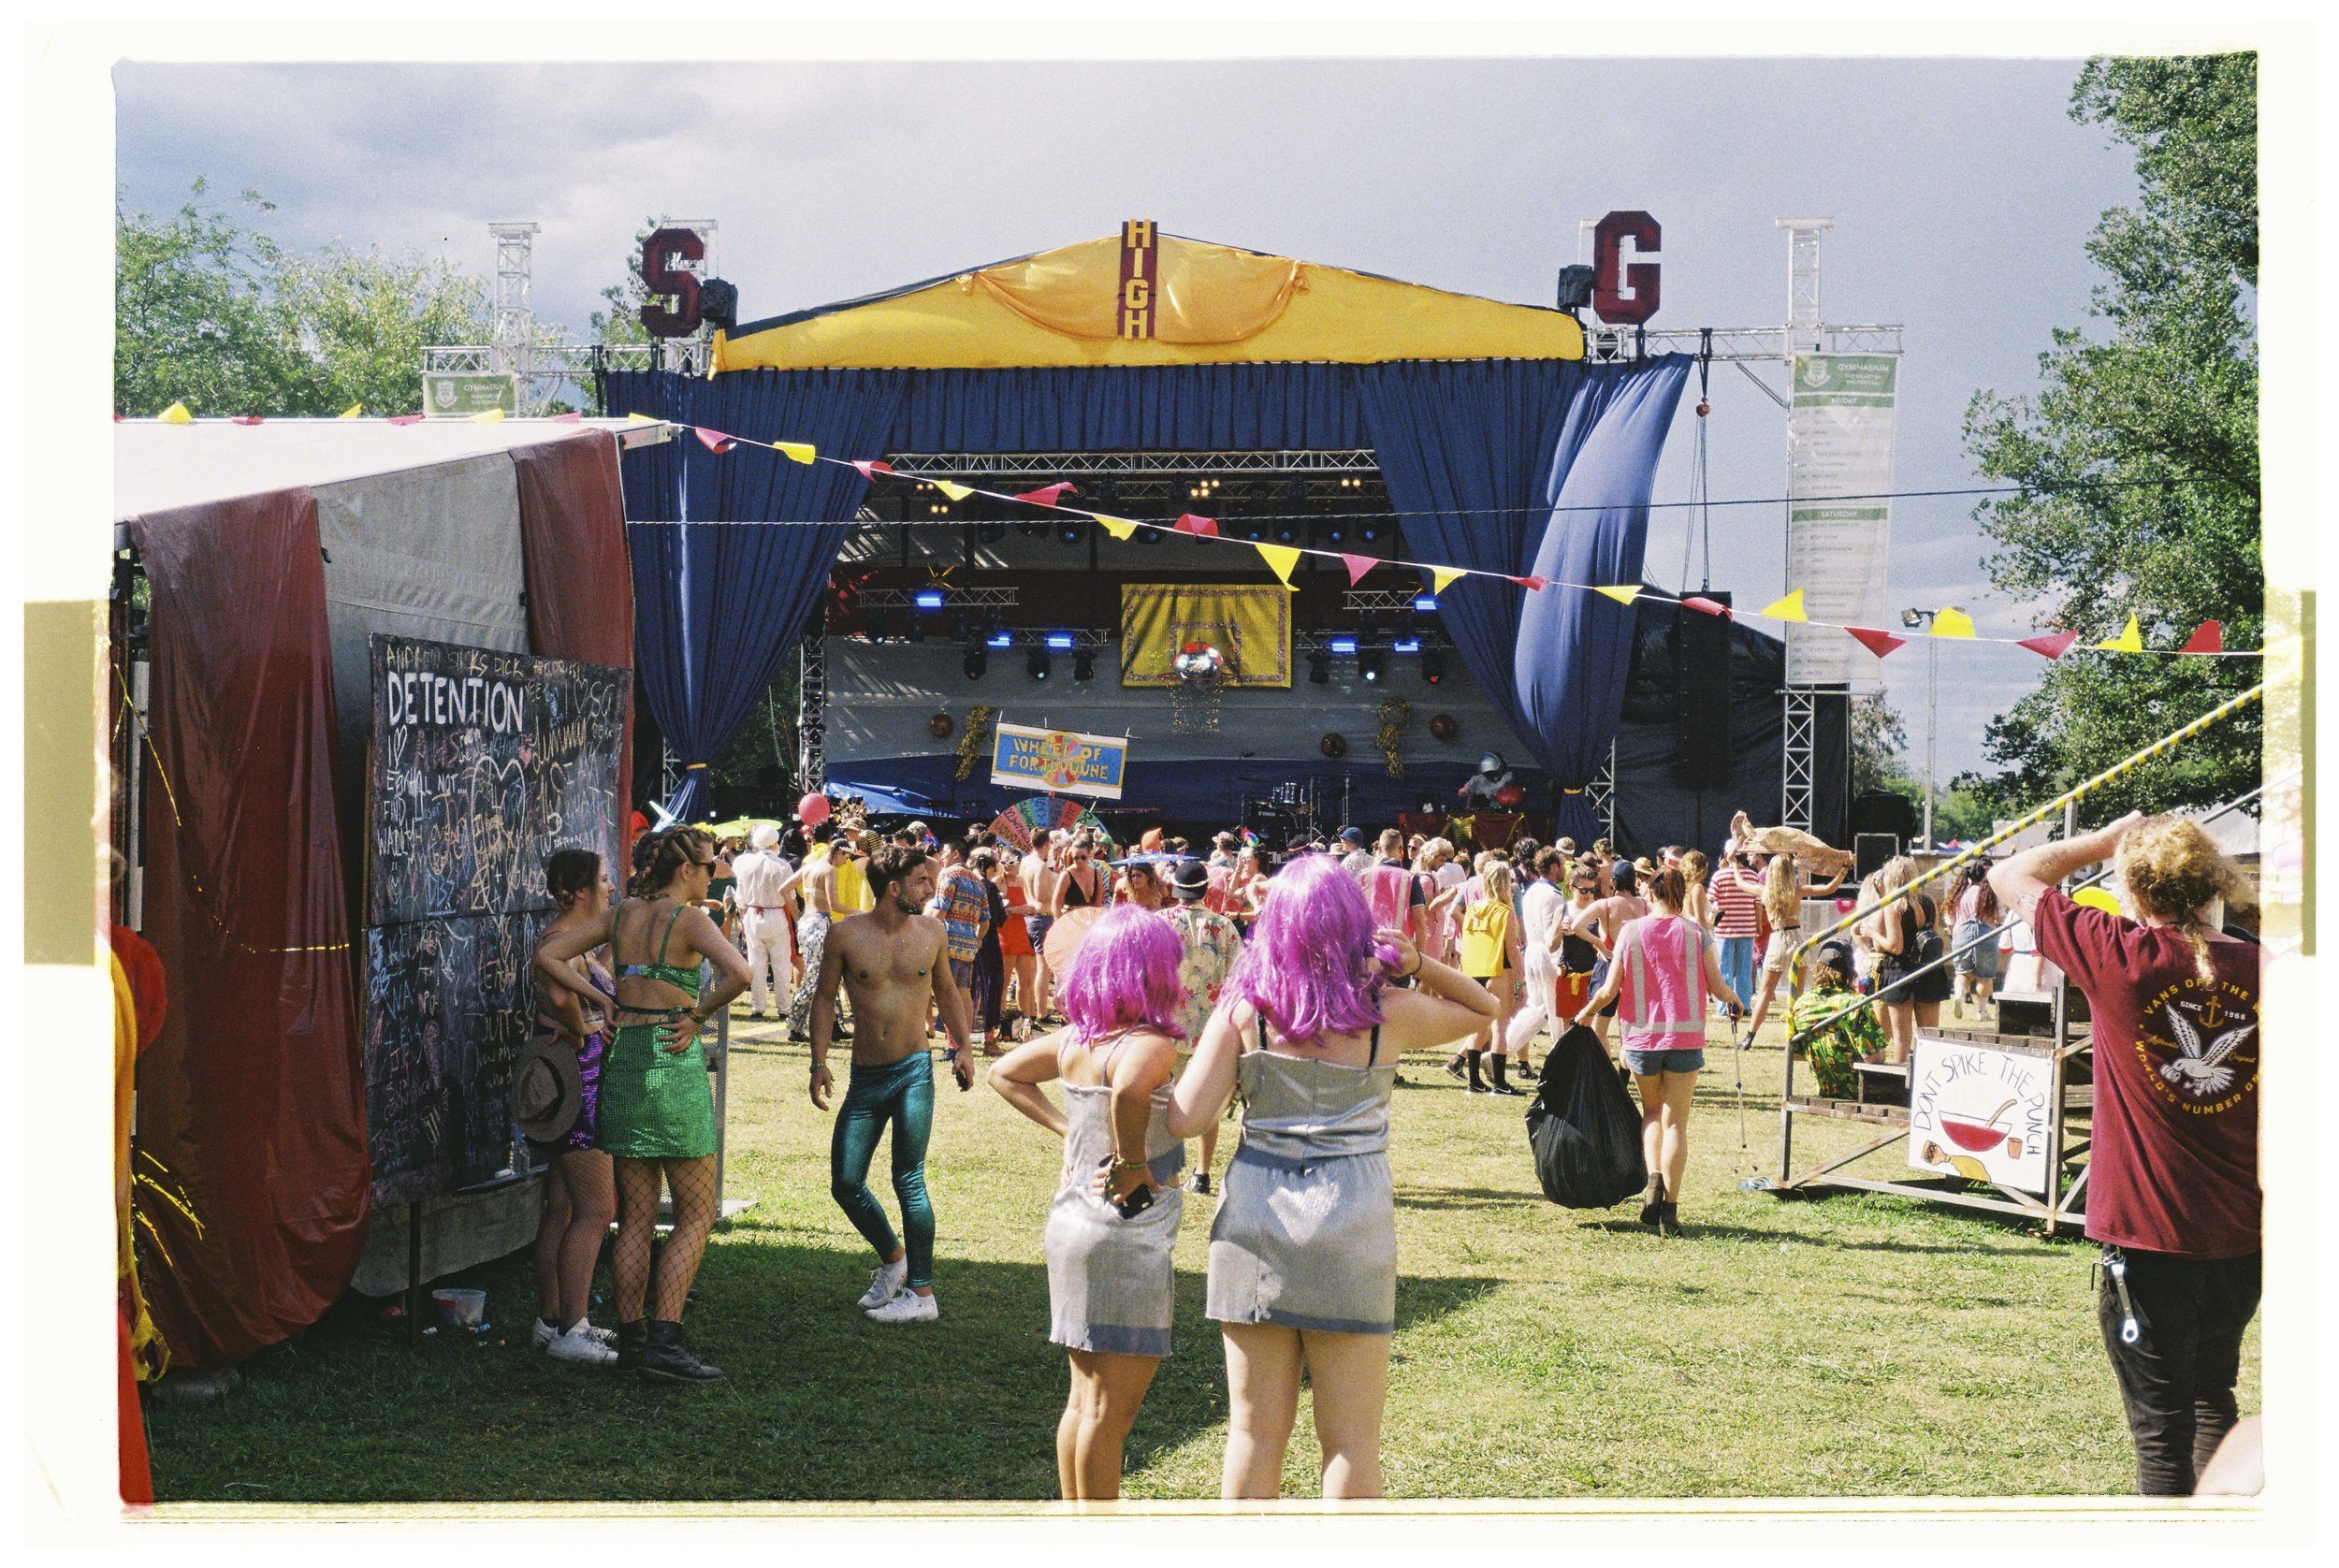 Crowd & Festival - Nikon F3 - Fuji Industrial 100 - 7.jpg